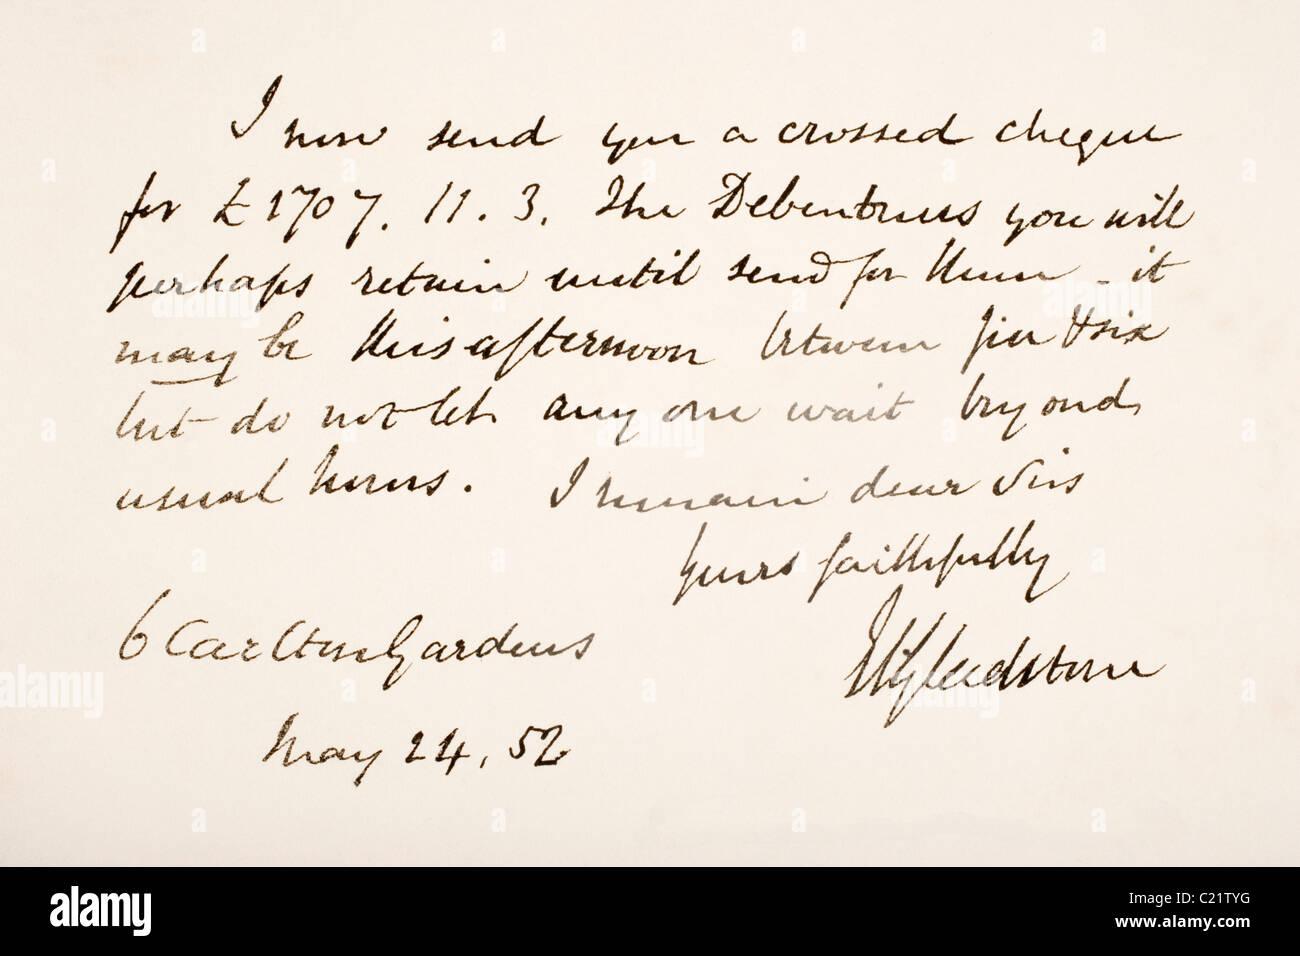 william ewart gladstone 1809 1898 british liberal statesman